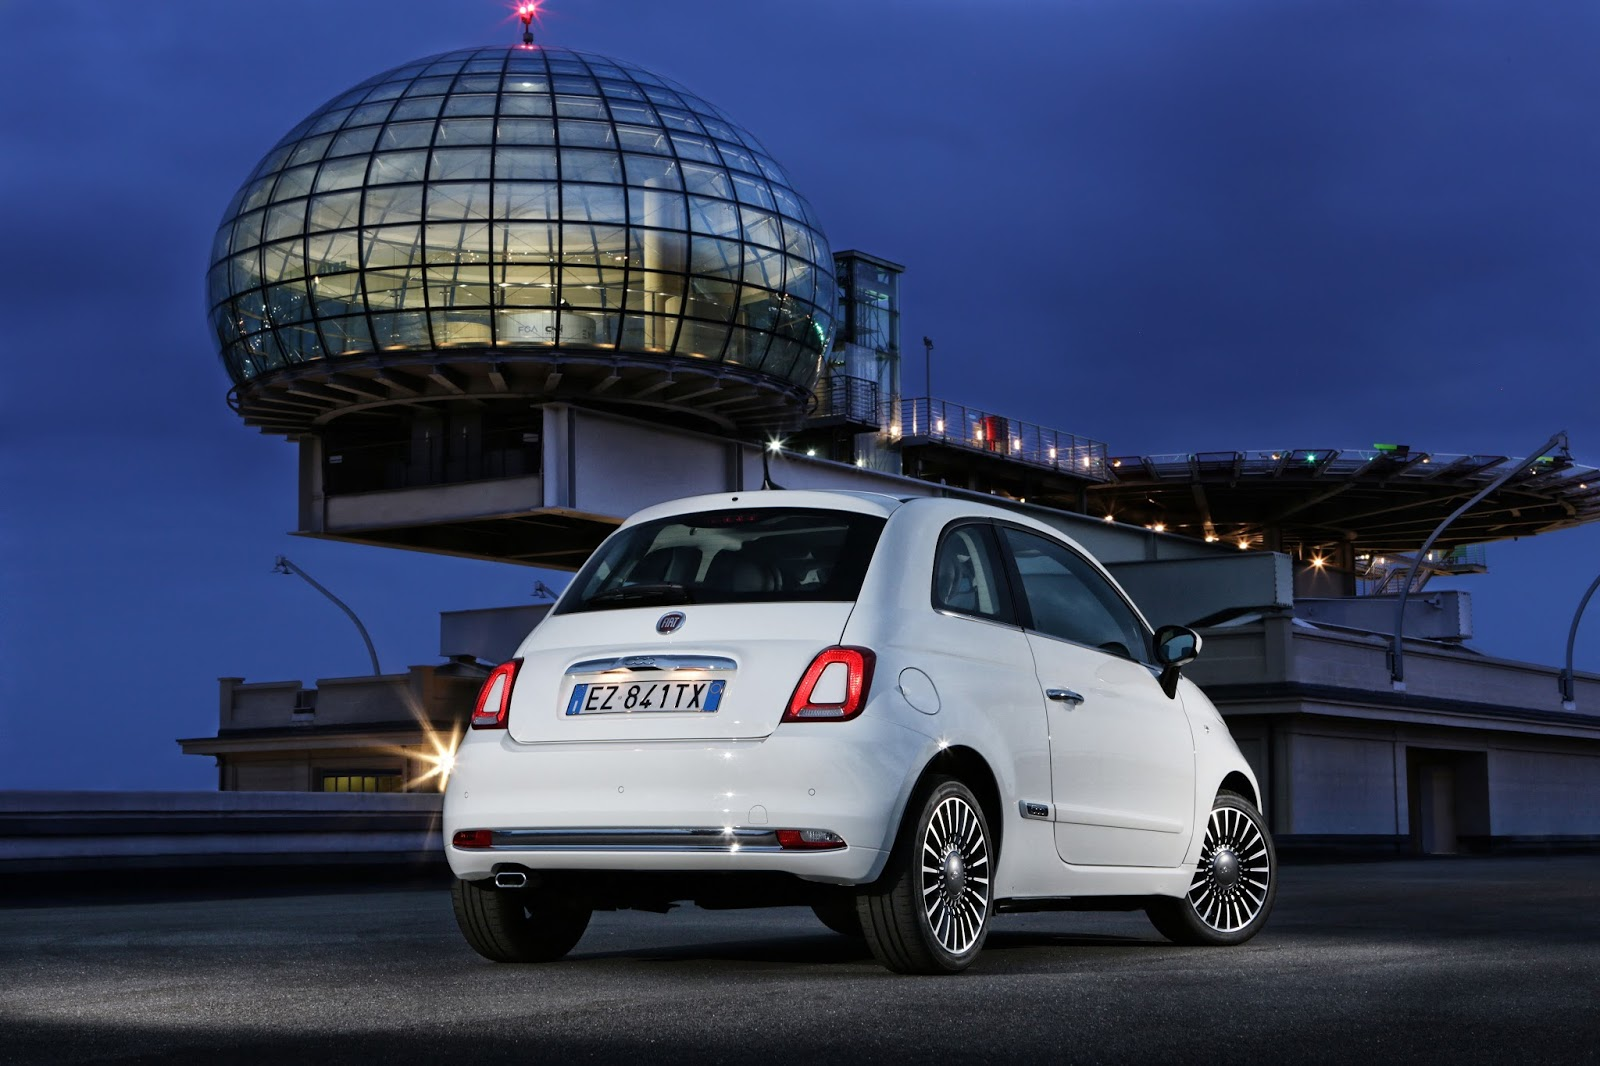 150703 FIAT Nuova 500 02 Η άφιξη του νέου Fiat 500 είναι γεγονός